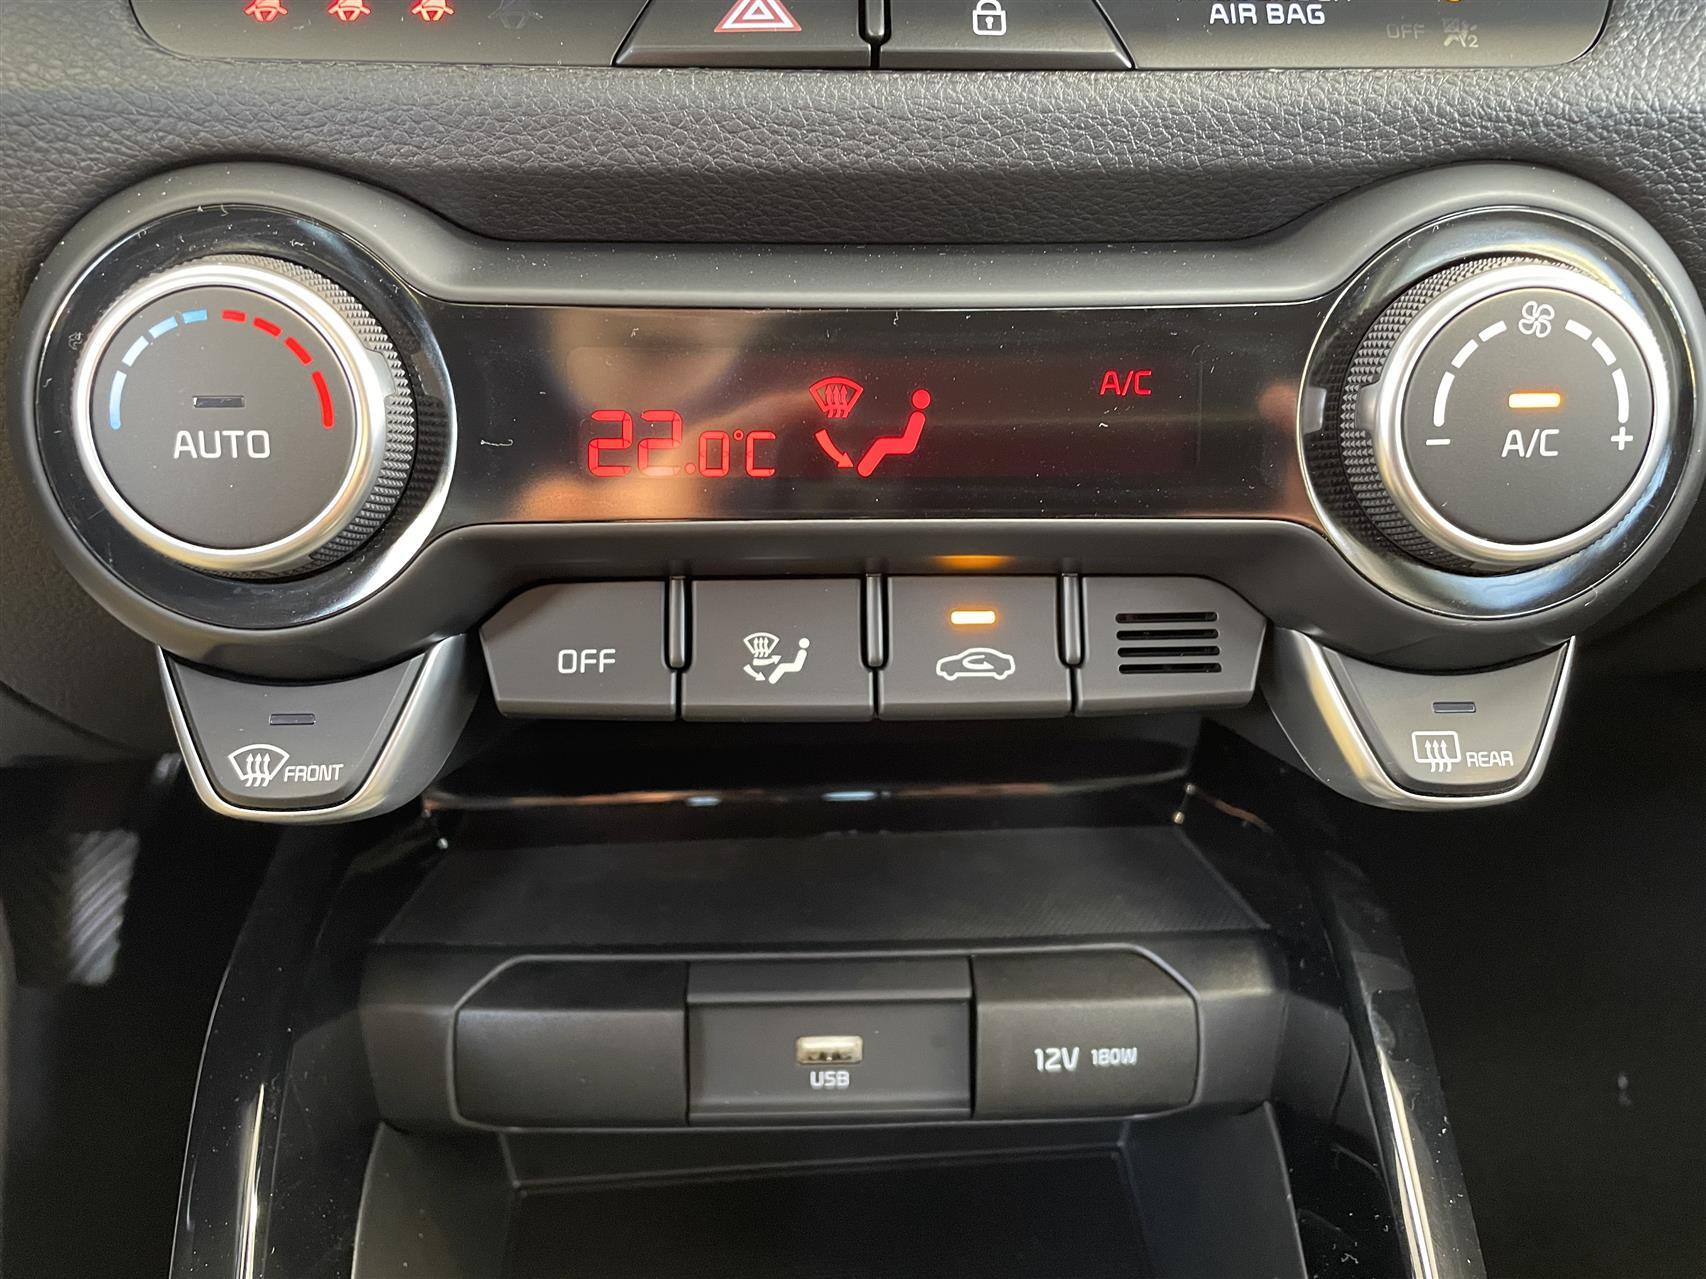 Billede af Kia Stonic 1,0 T-GDI Prestige Upgrade MY21 100HK 5d